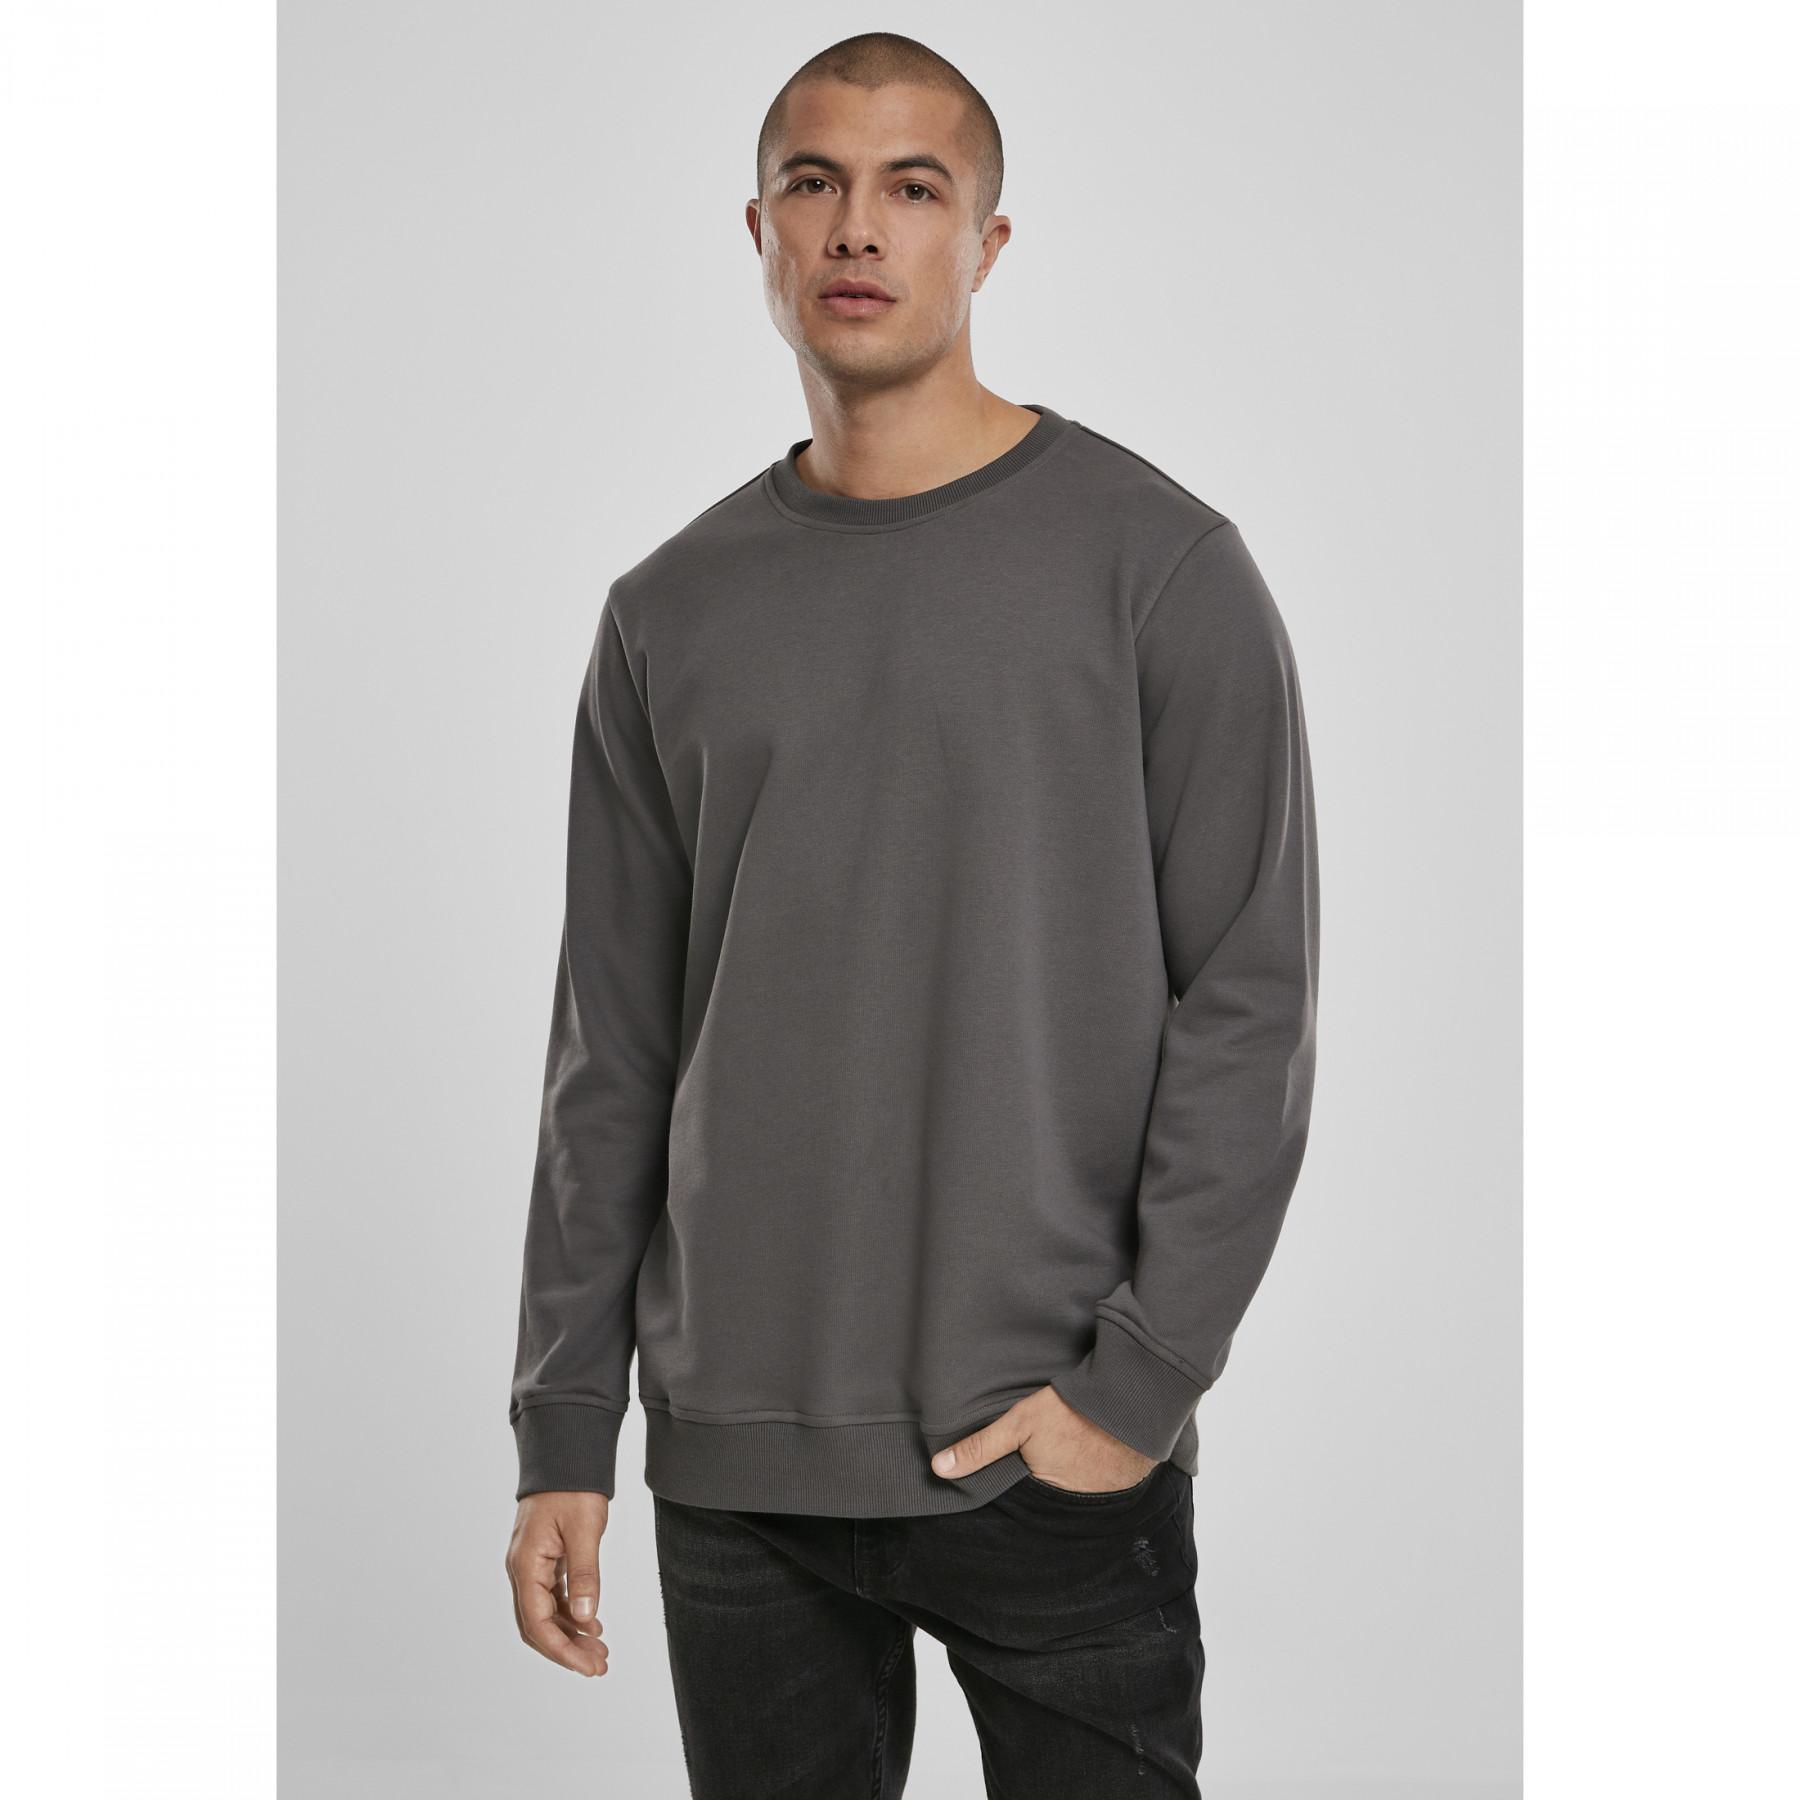 Sweatshirt Urban Classic basic terry crew